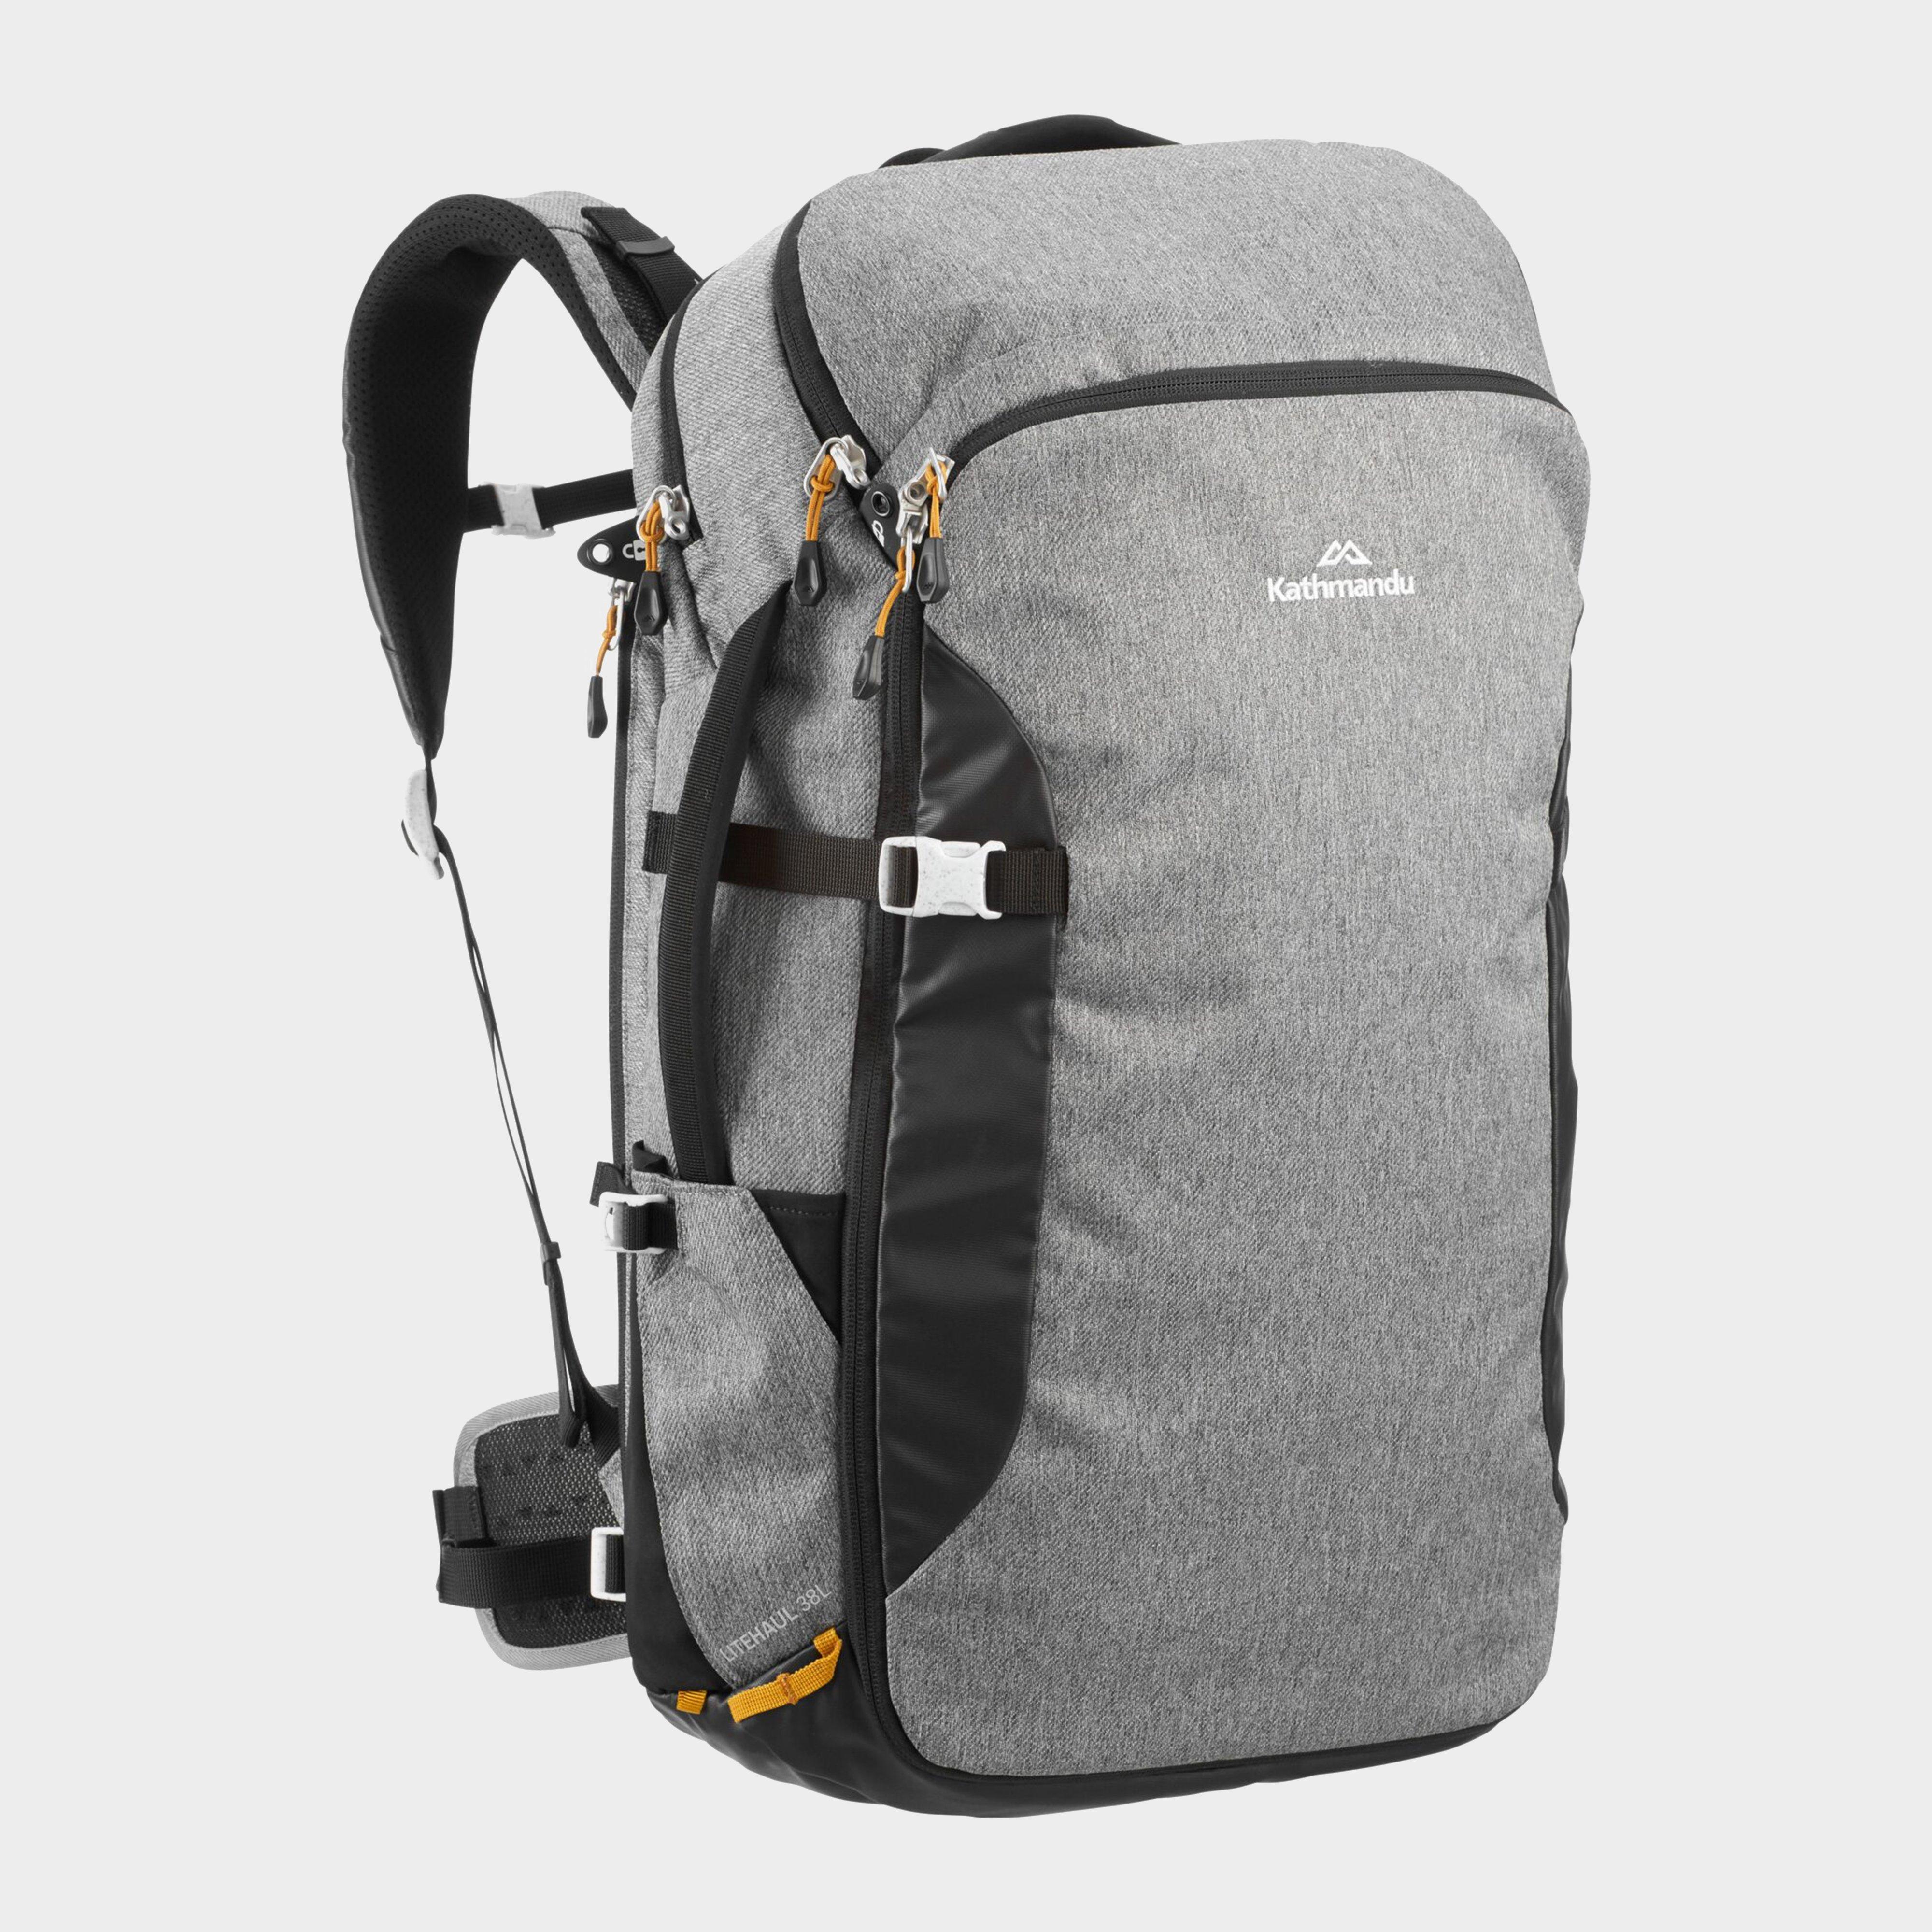 Kathmandu Litehaul Carry-On 38L, Grey